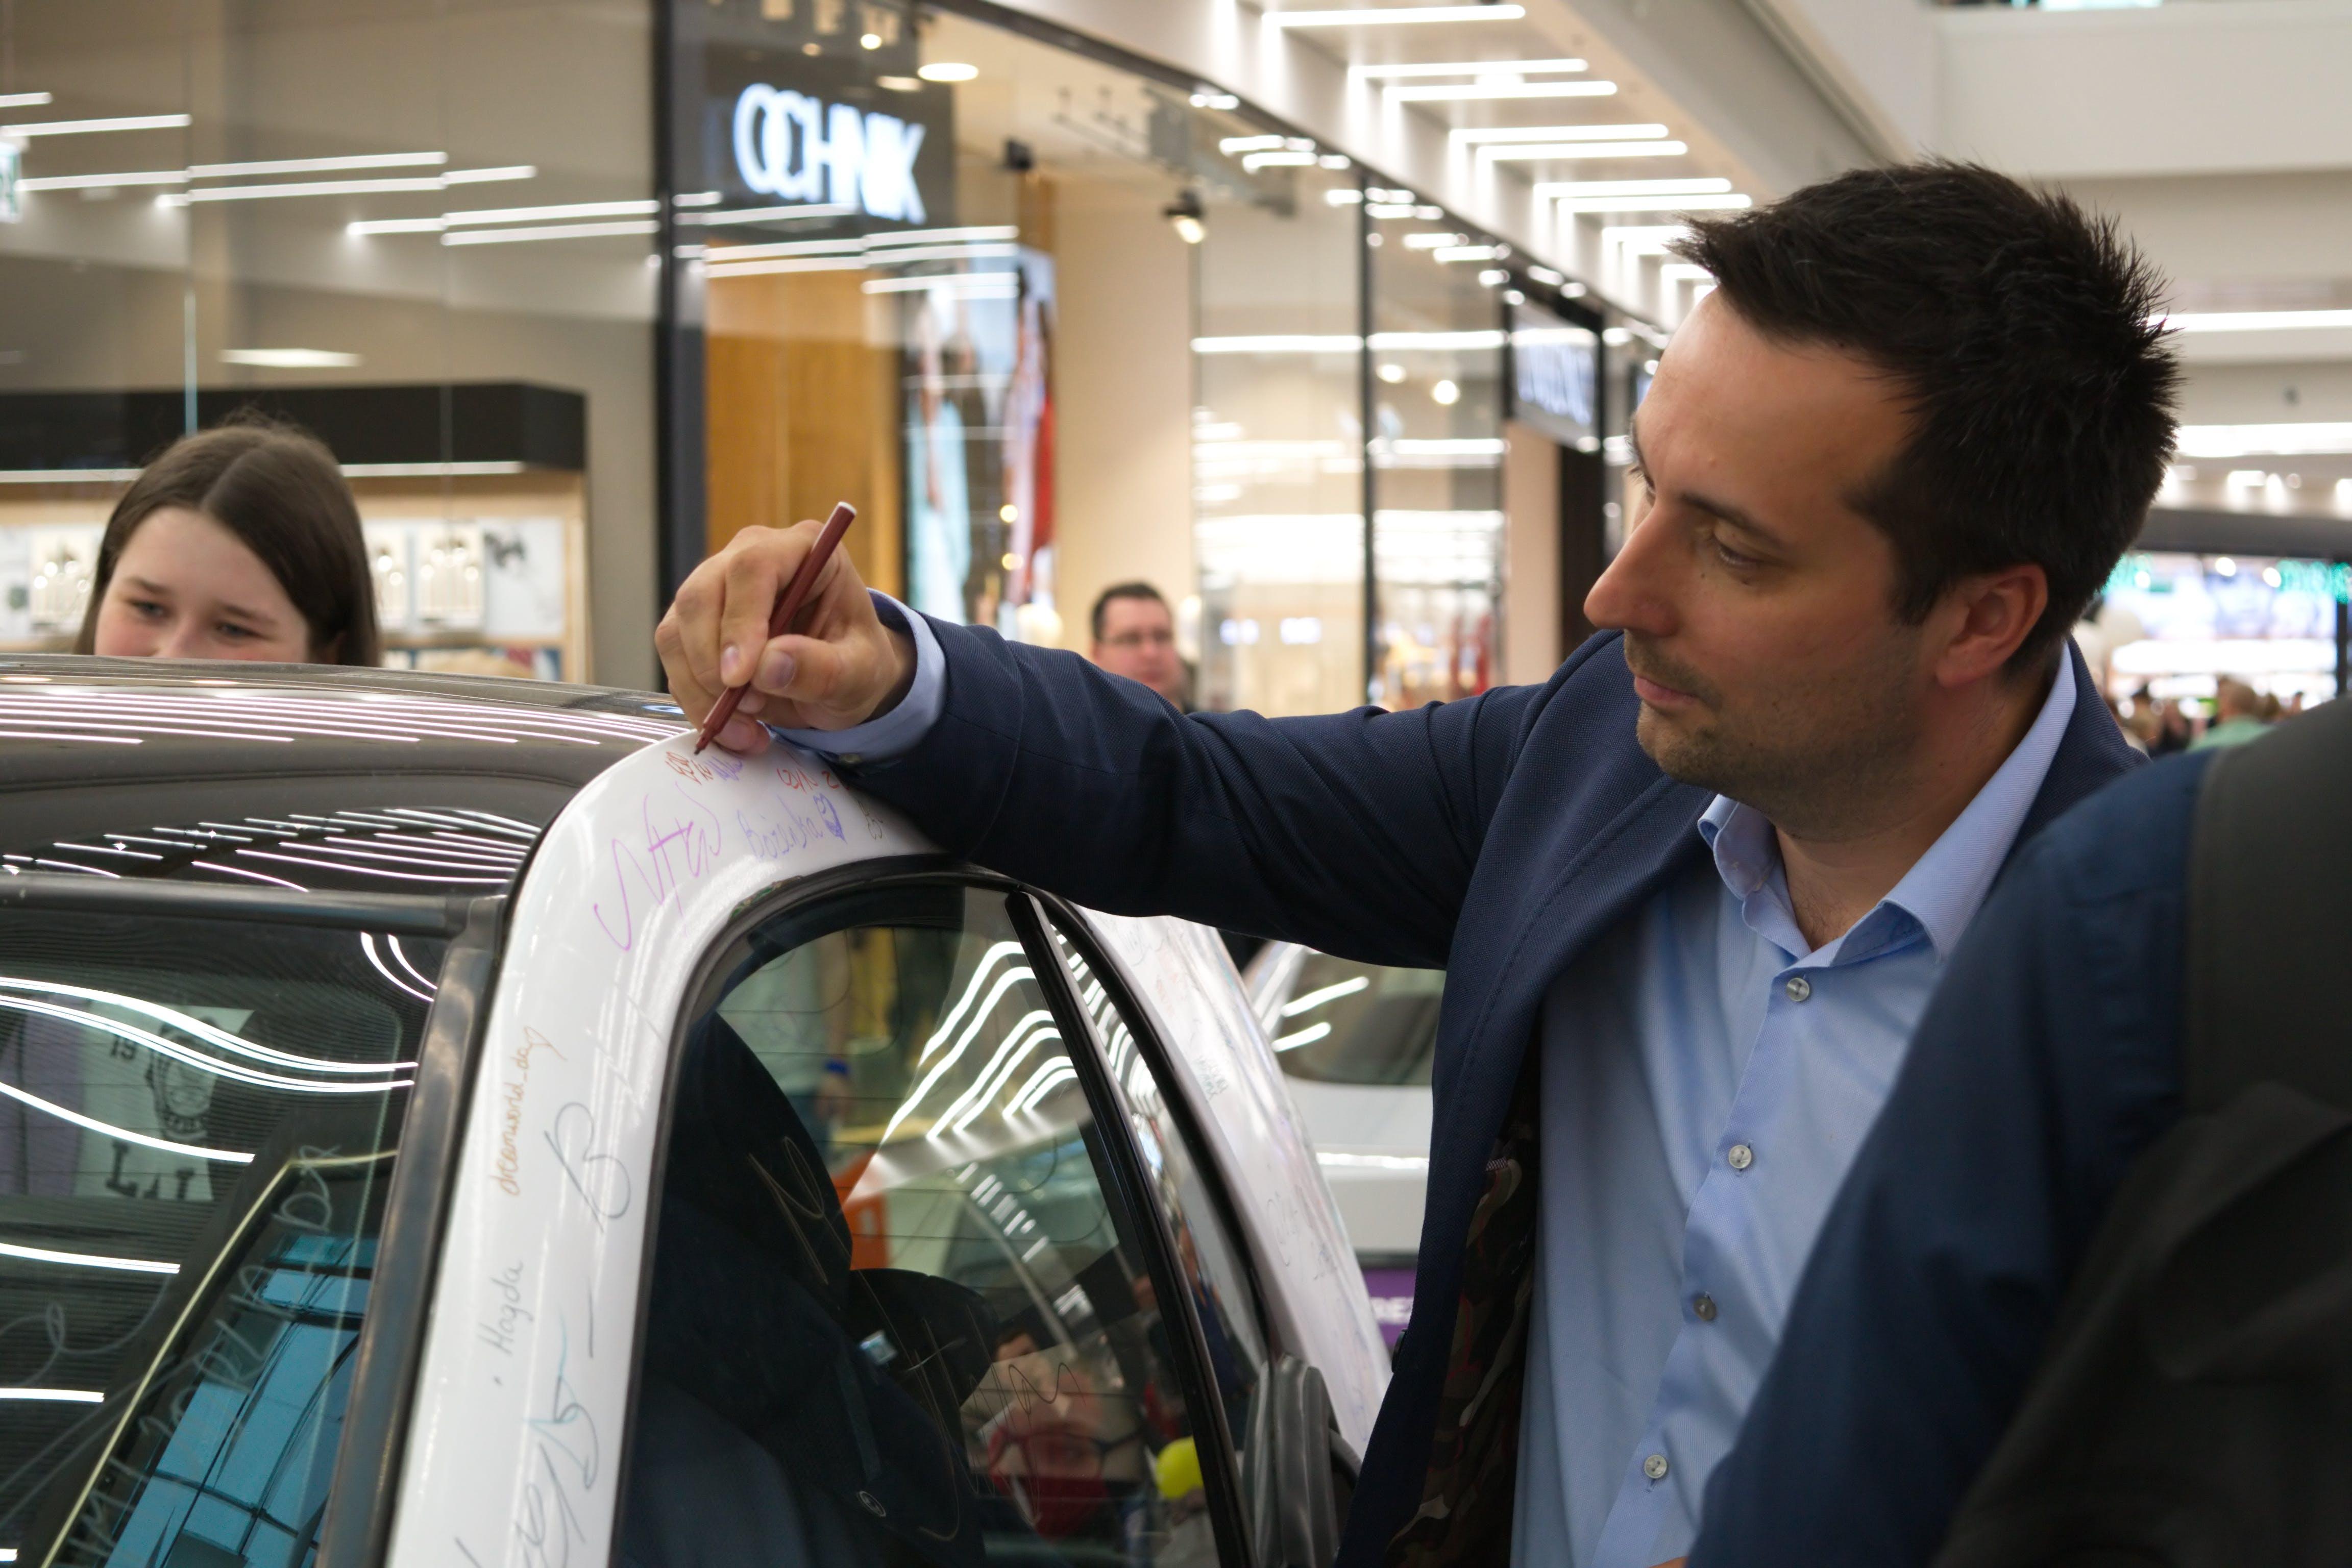 Kostnadsfri bild av bil, bilar, butiker, inomhus